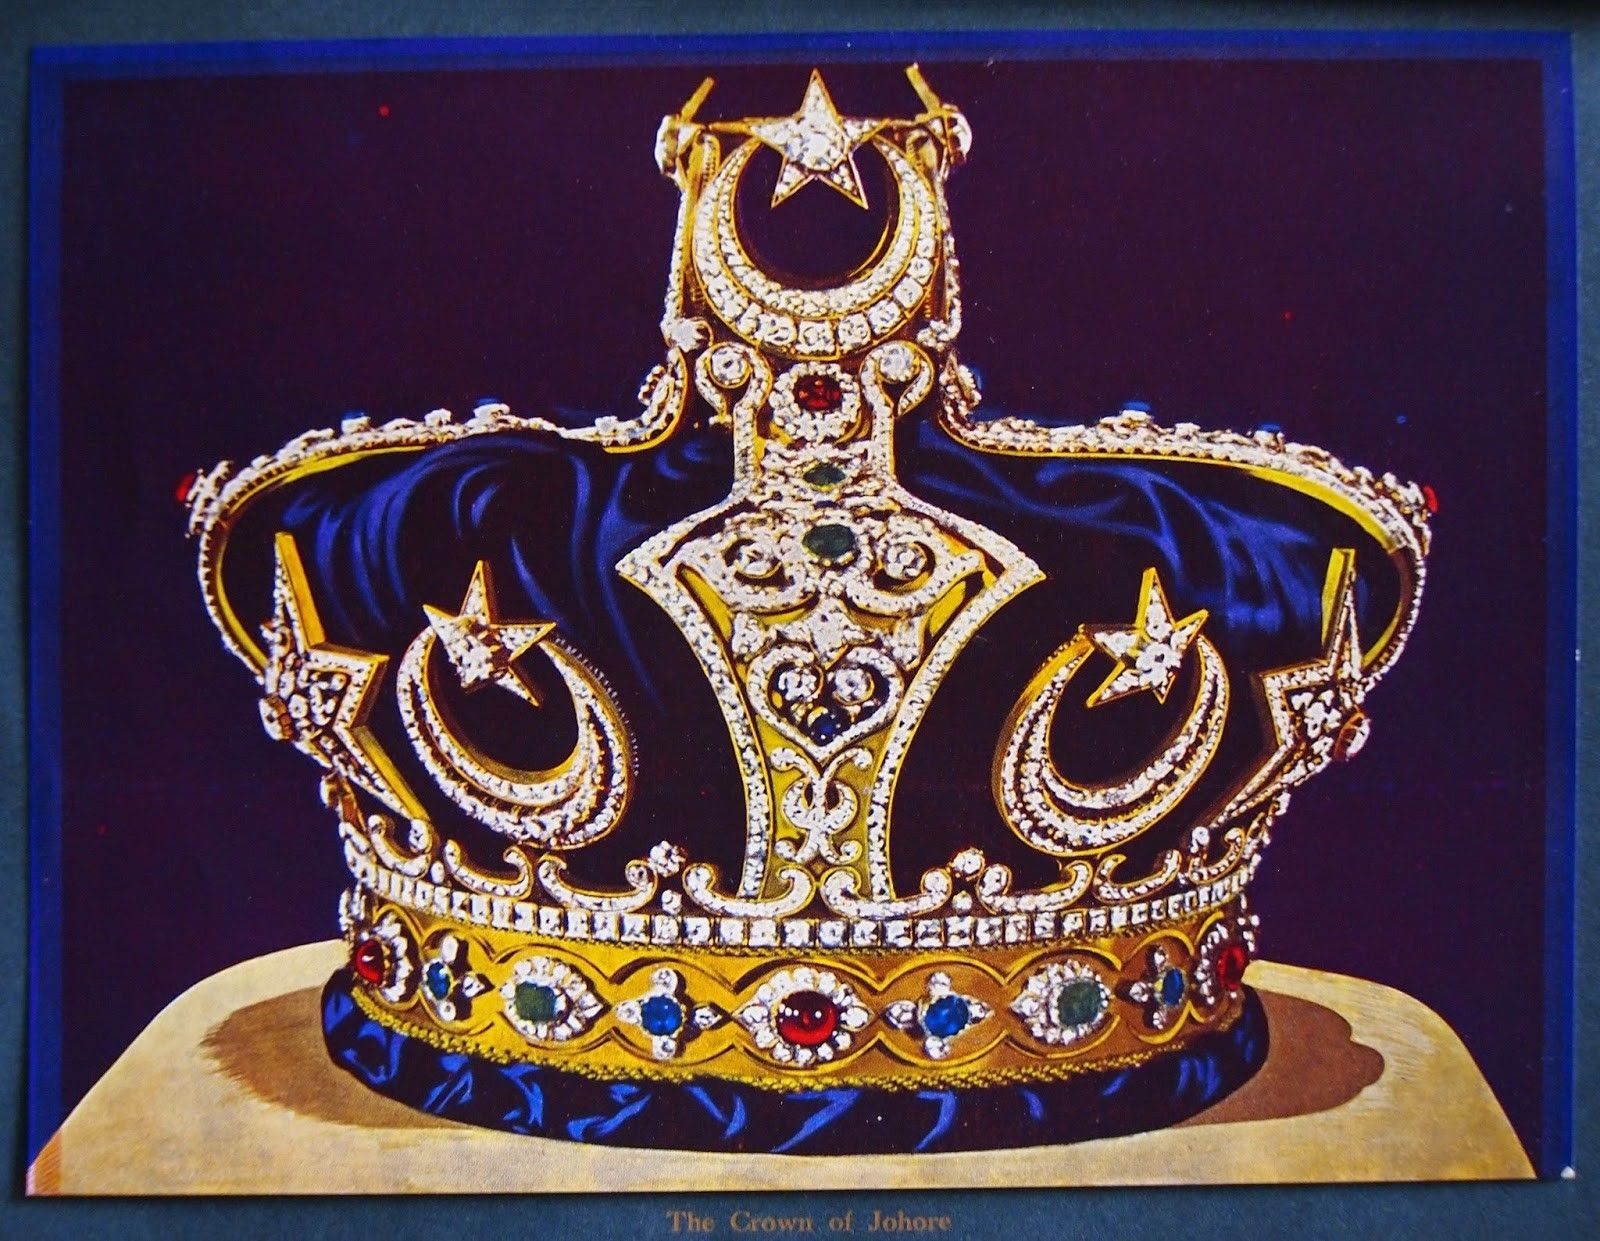 фото фото самой дорогой турецкой короны для мужчин кабан лесу